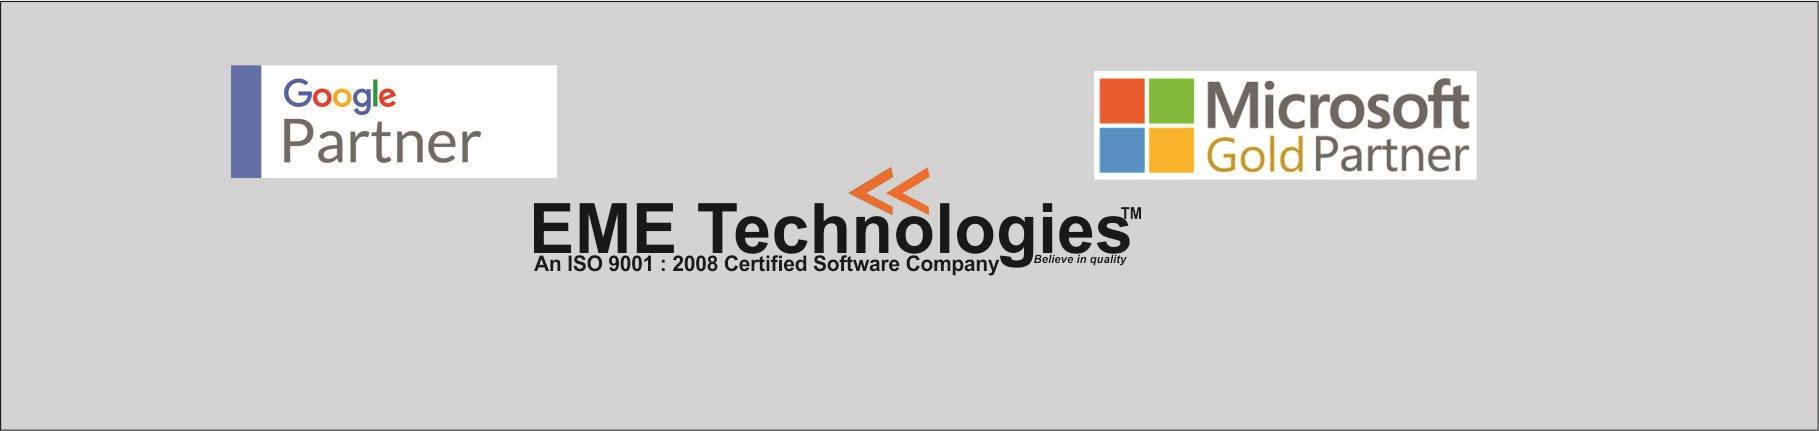 EME technologies mohali